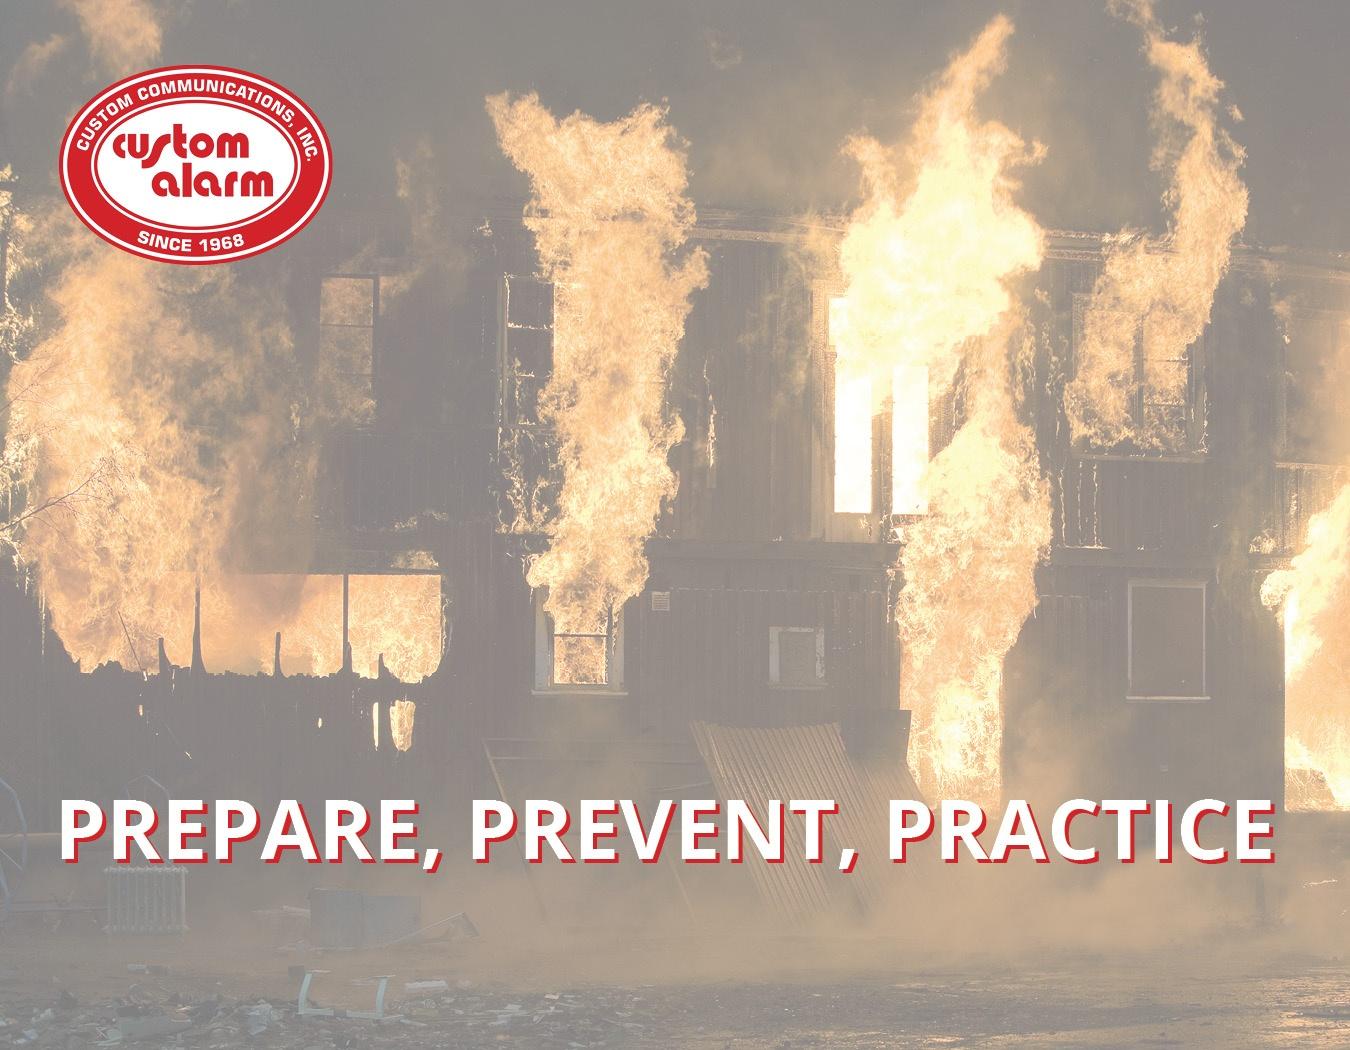 prepare.prevent.practice